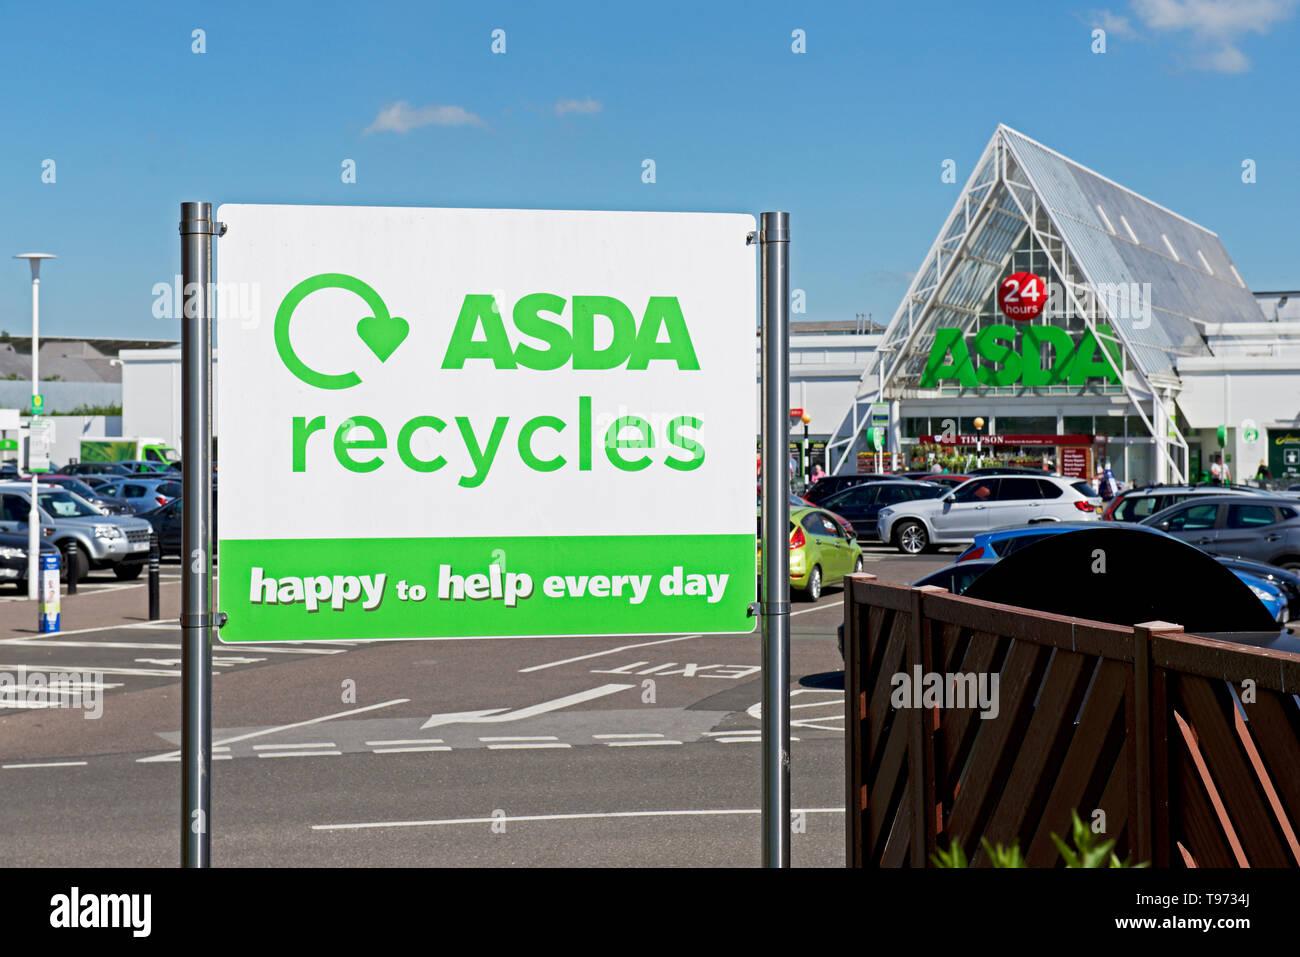 ASDA supermarket in Lakeside Village, Doncaster, South Yorkshire - Stock Image